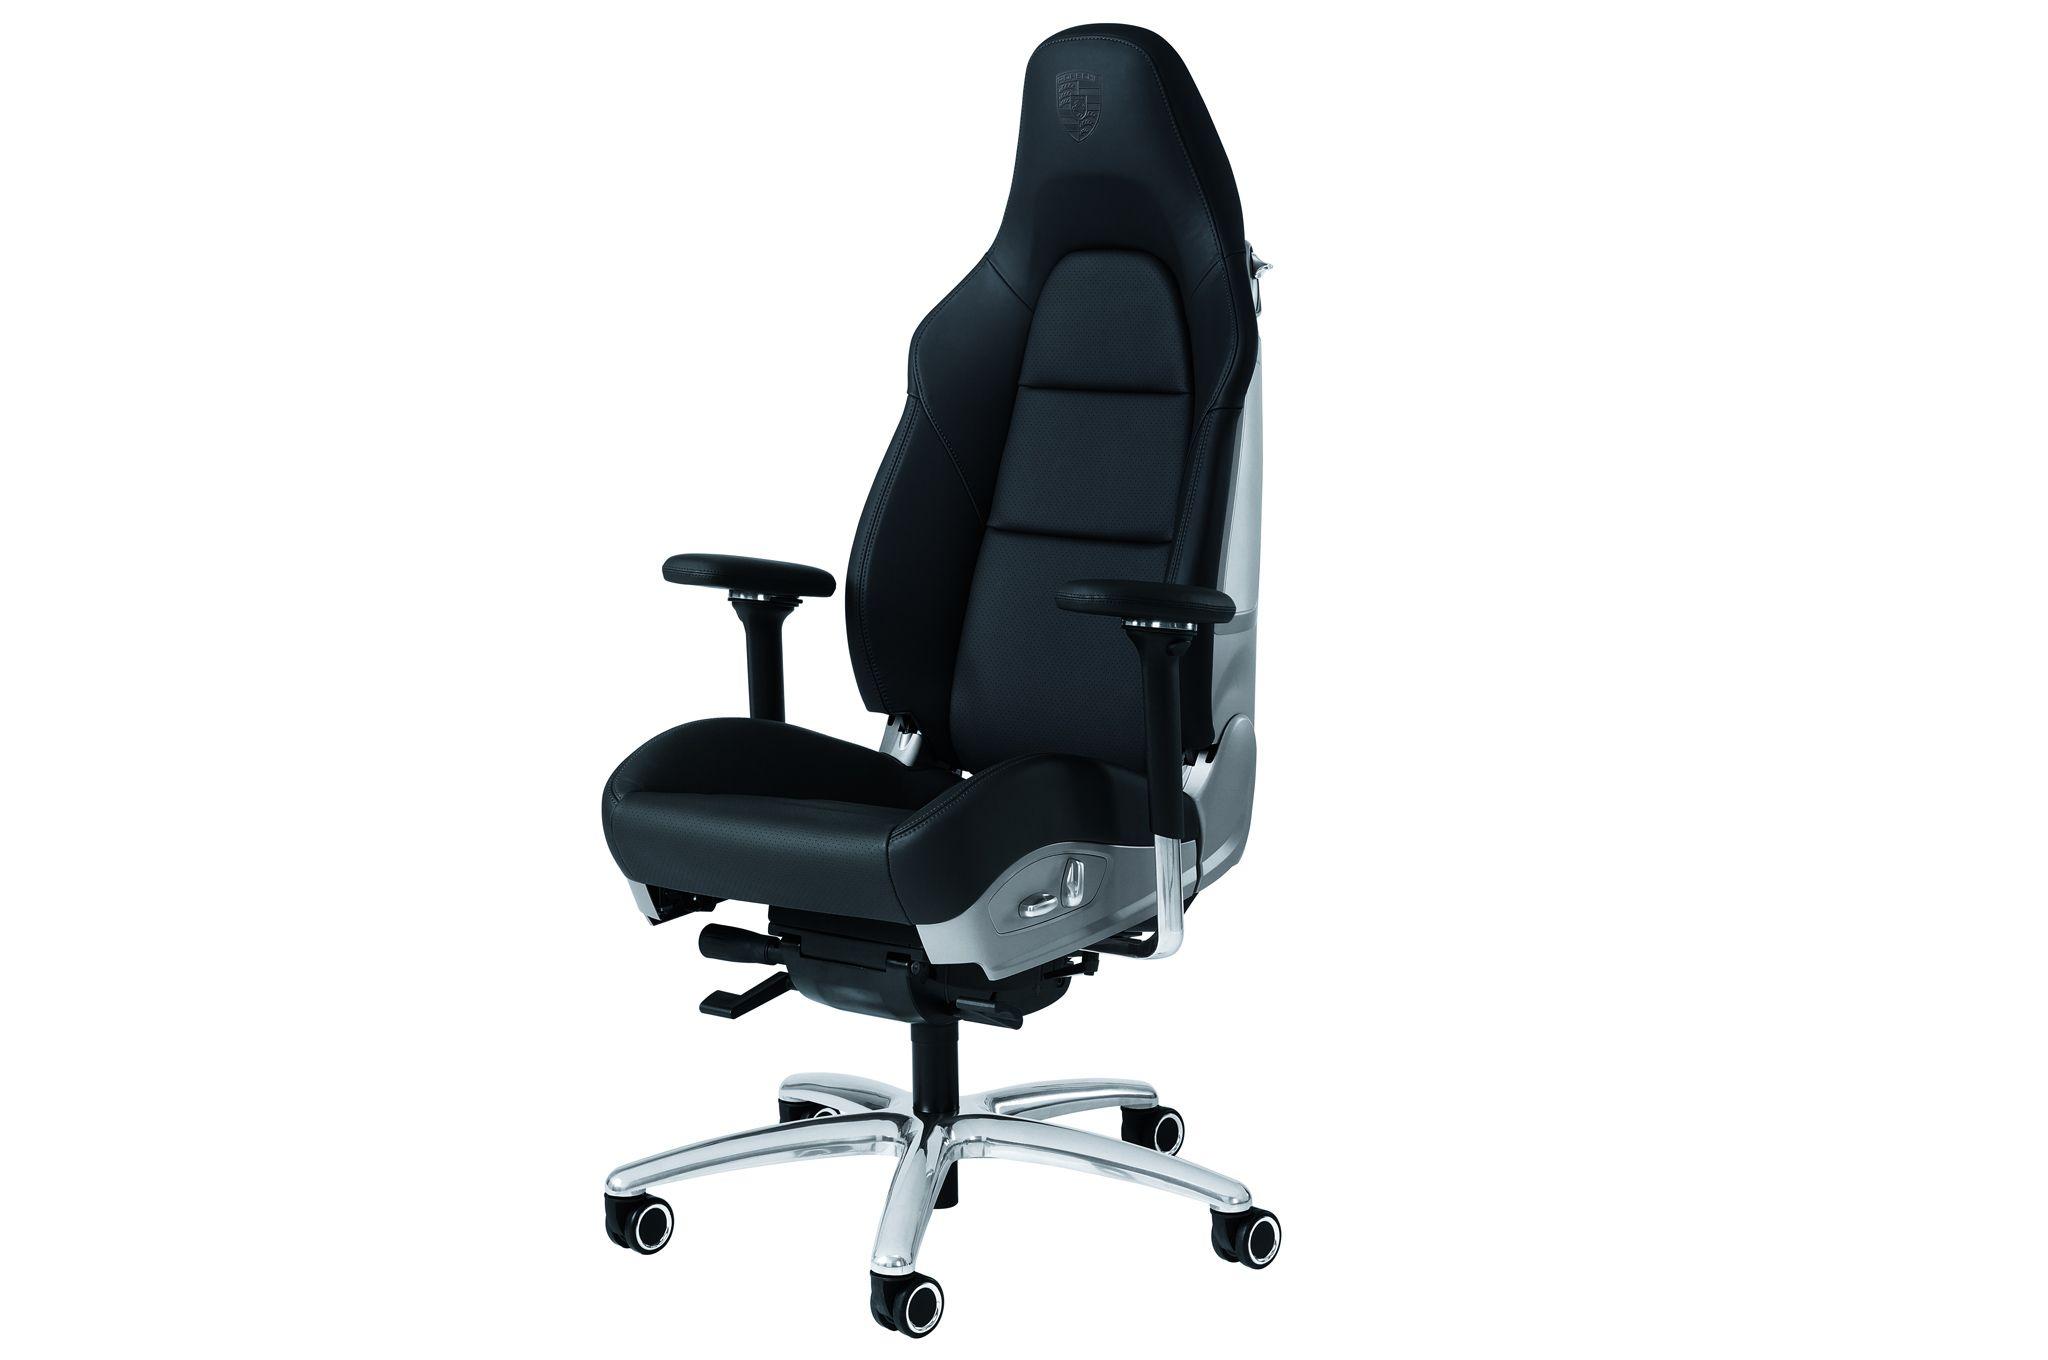 cool Perfect Porsche Office Chair 51 On Home Design Ideas with Porsche Office Chair Check more at //good-furniture.net/porsche-office-chair/  sc 1 st  Pinterest & cool Perfect Porsche Office Chair 51 On Home Design Ideas with ...